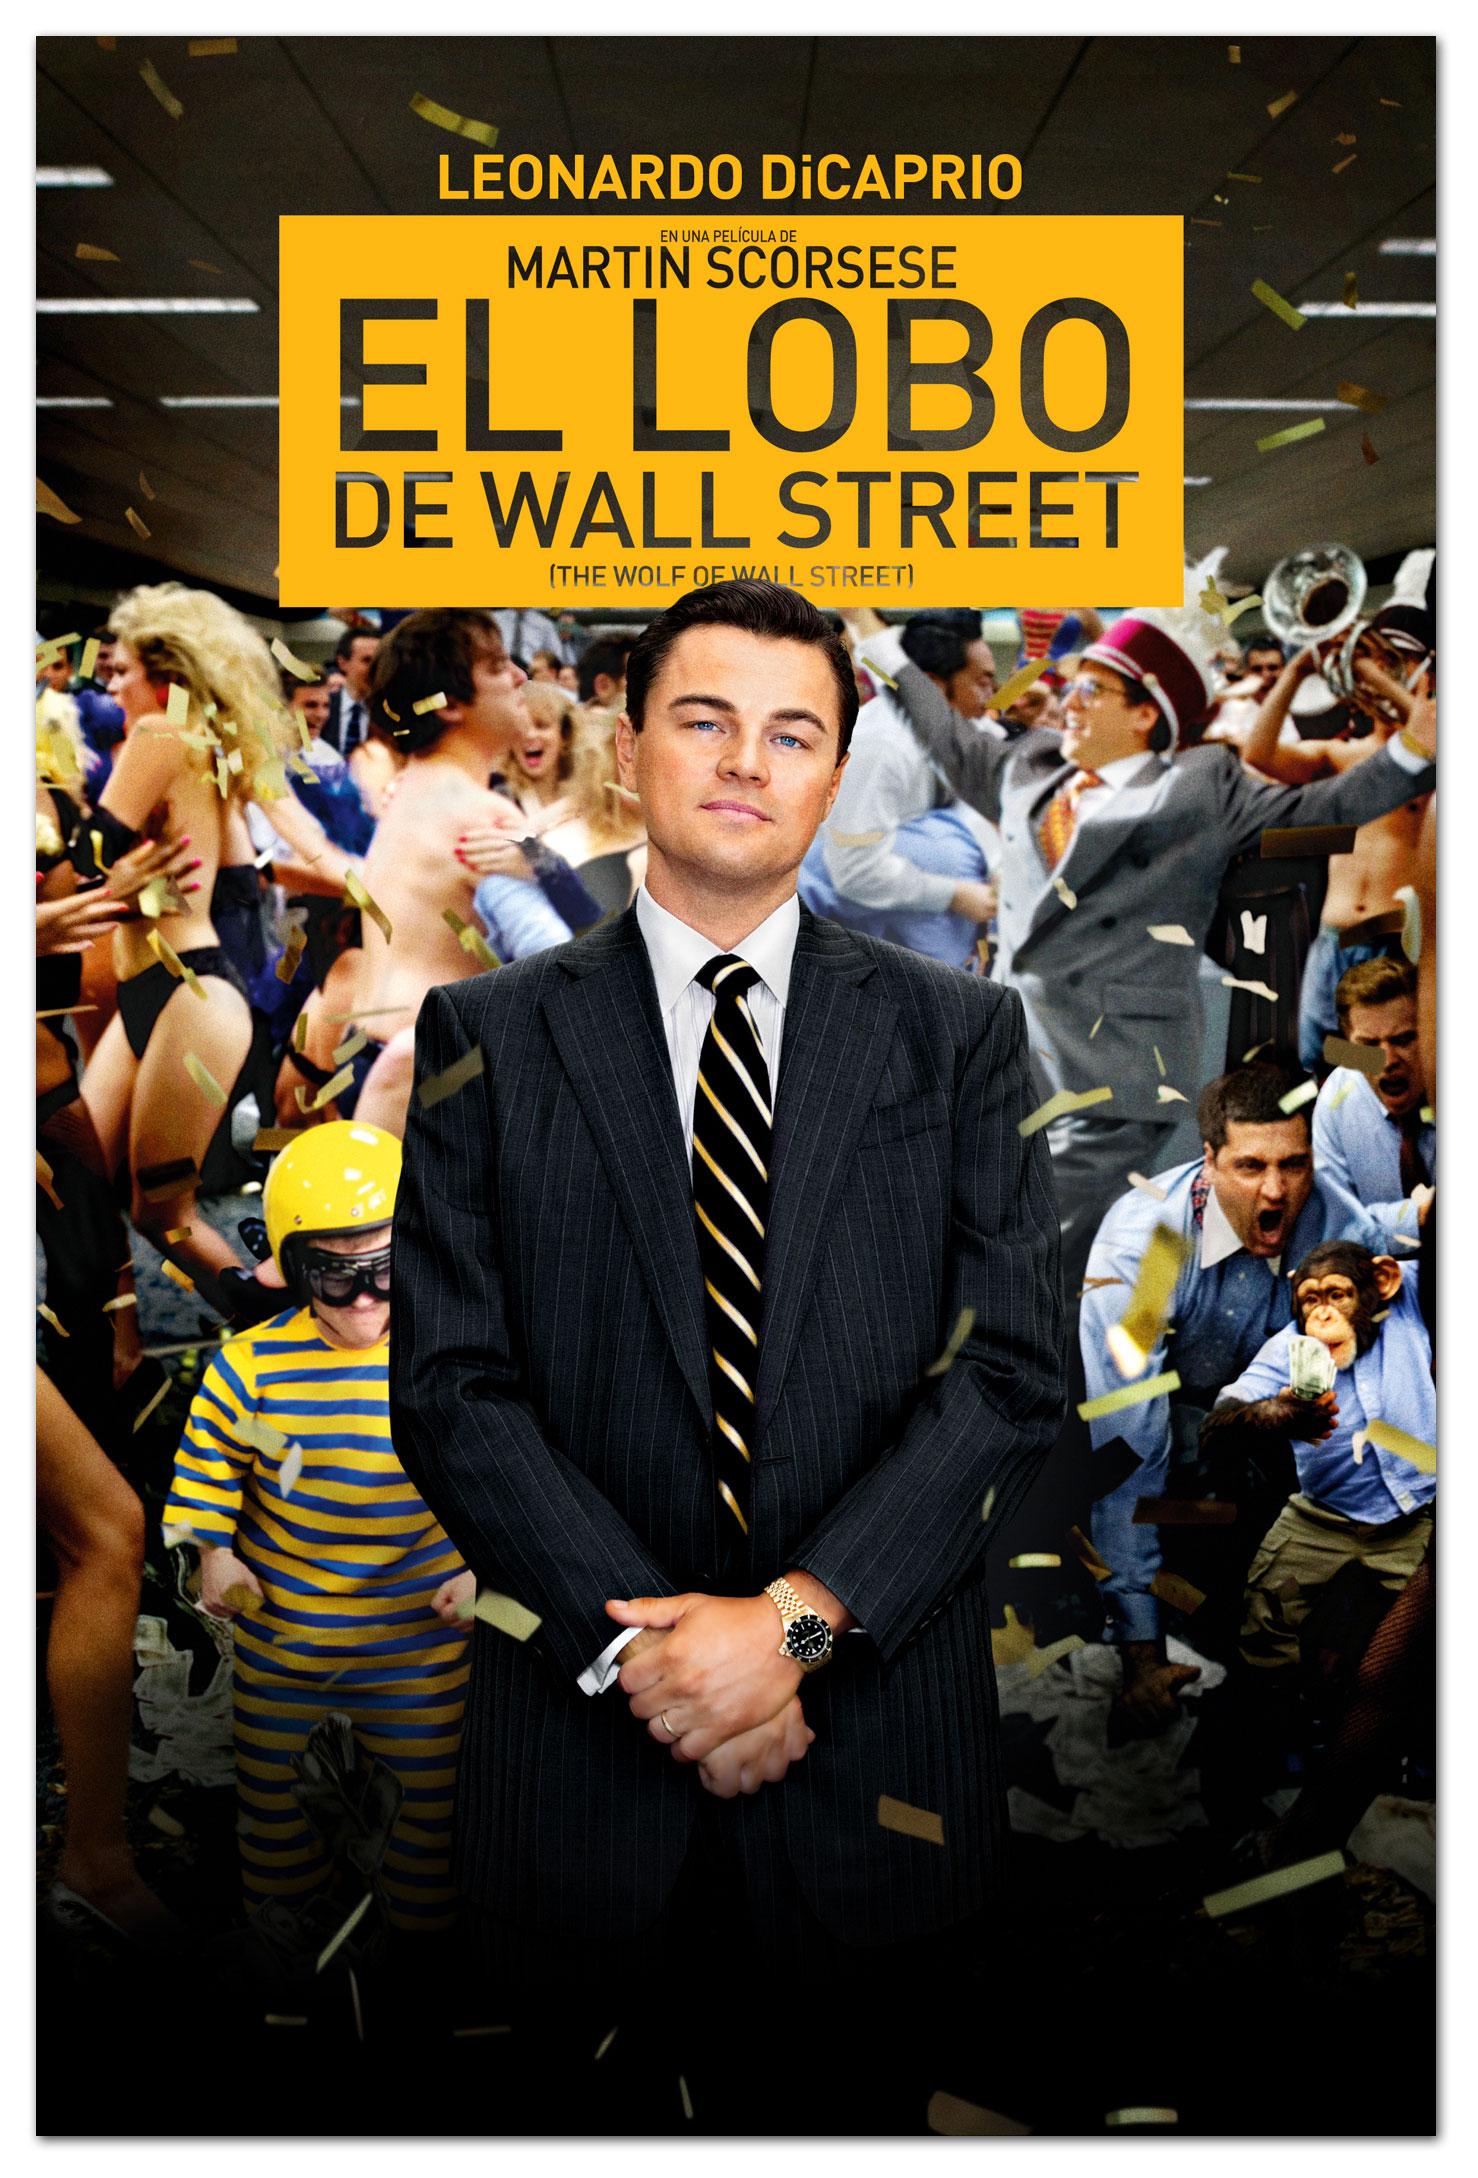 El lobo de Wall Street - Martin Scorsese